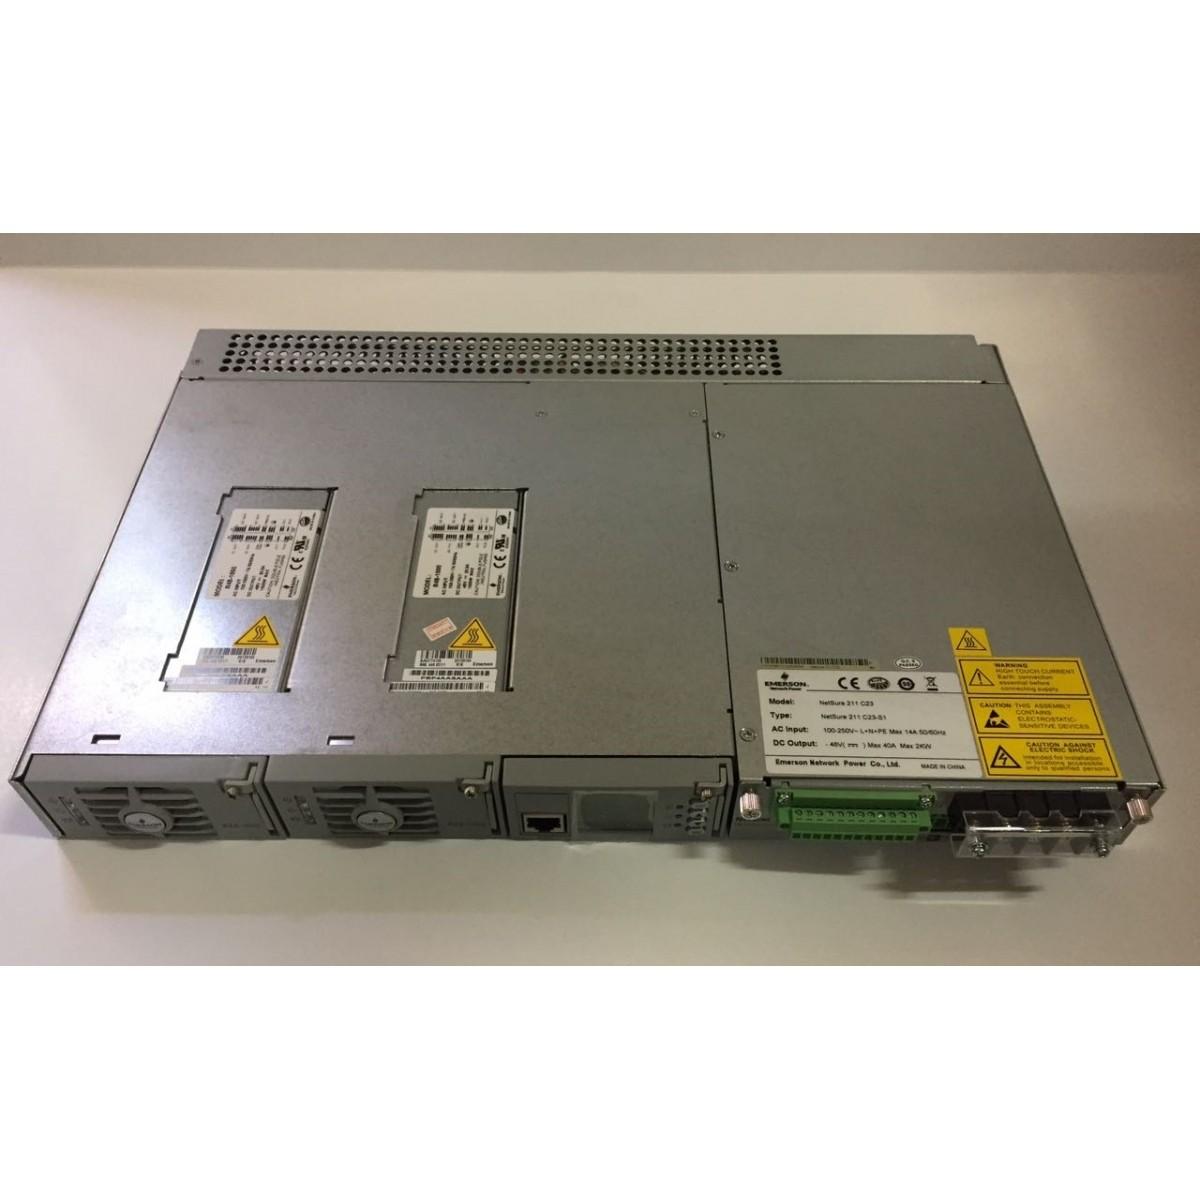 FONTE OLT EMERSON NETSURE211 C23 40AMP REDUNDANTE CHASSIS  - TECTECH BRASIL COMPUTERS